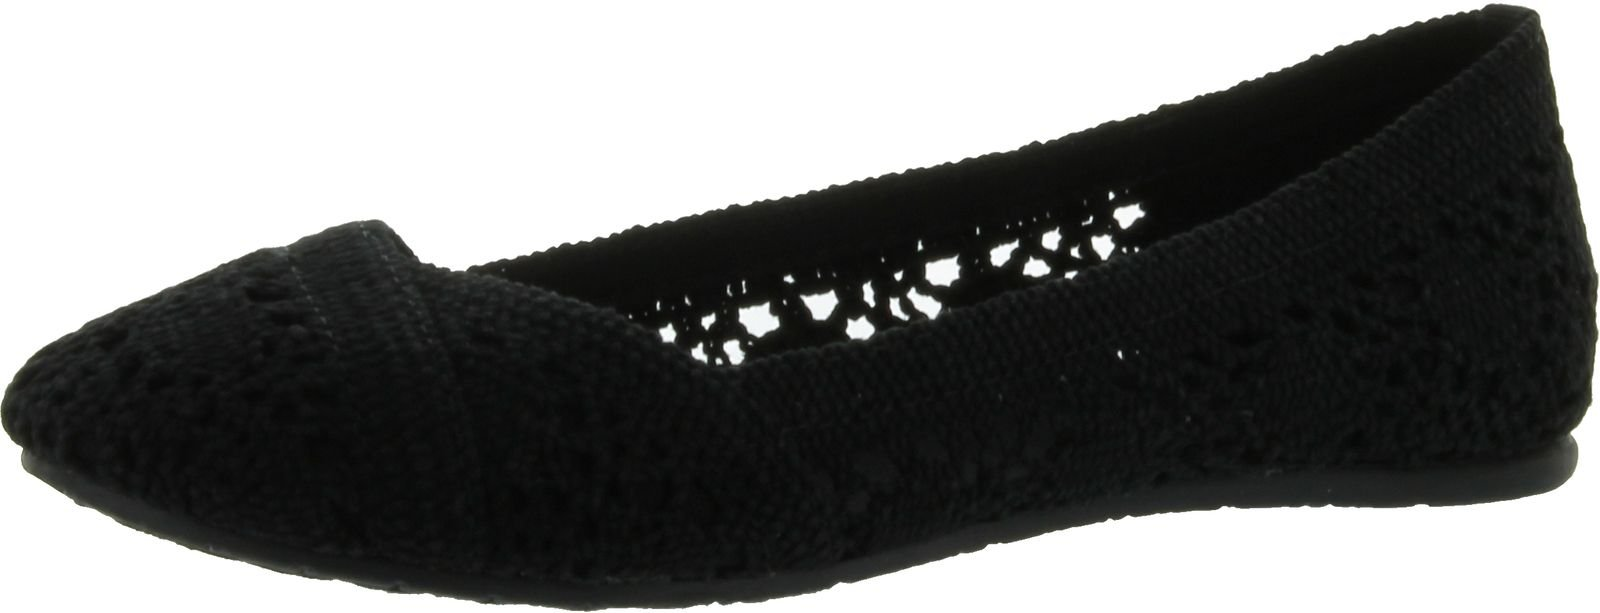 Soda Women Faddy-S Flats-Shoes,Black,6